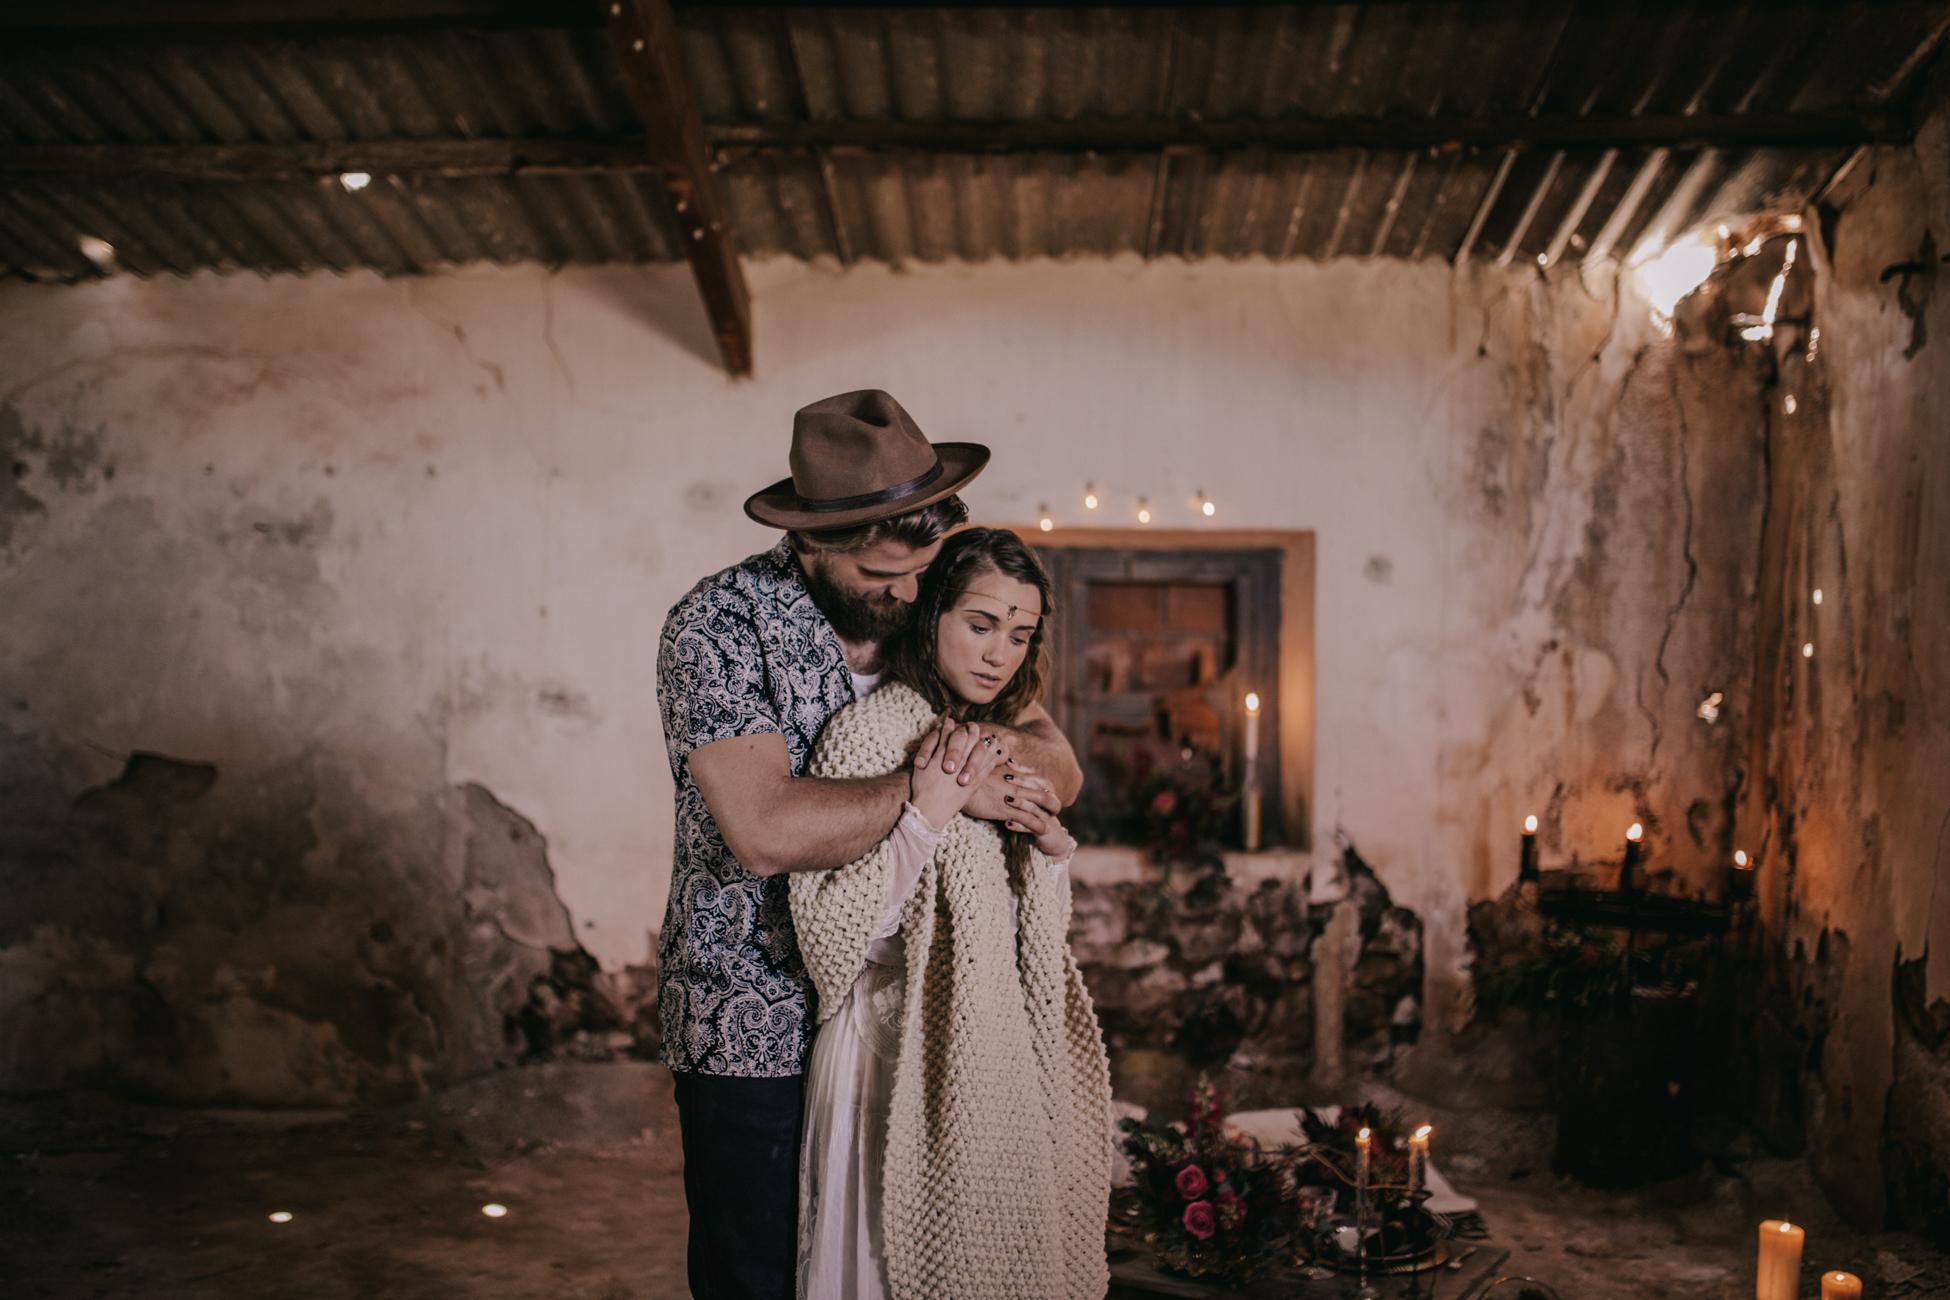 thenortherngirlphotography_photography_thenortherngirl_rebeccascabros_wedding_weddingphotography_weddingphotographer_wood_muebles_deco_bodasdecaramelo_home_bedtime_gaywedding_editorial_desierto_desert_wildestdreams_amortexano-200.jpg